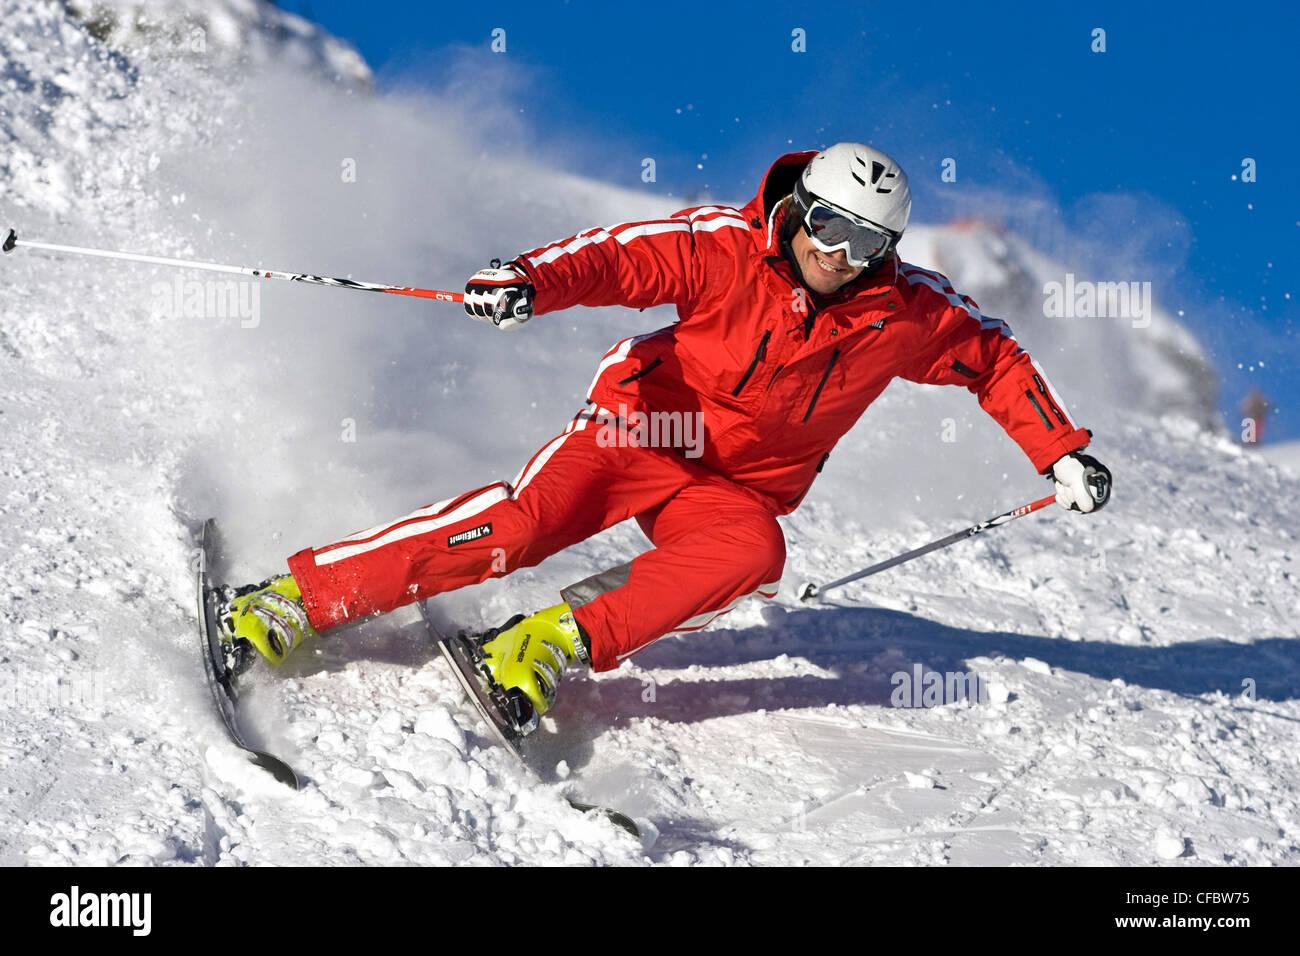 Carving skiing extreme man ski winter sports fun